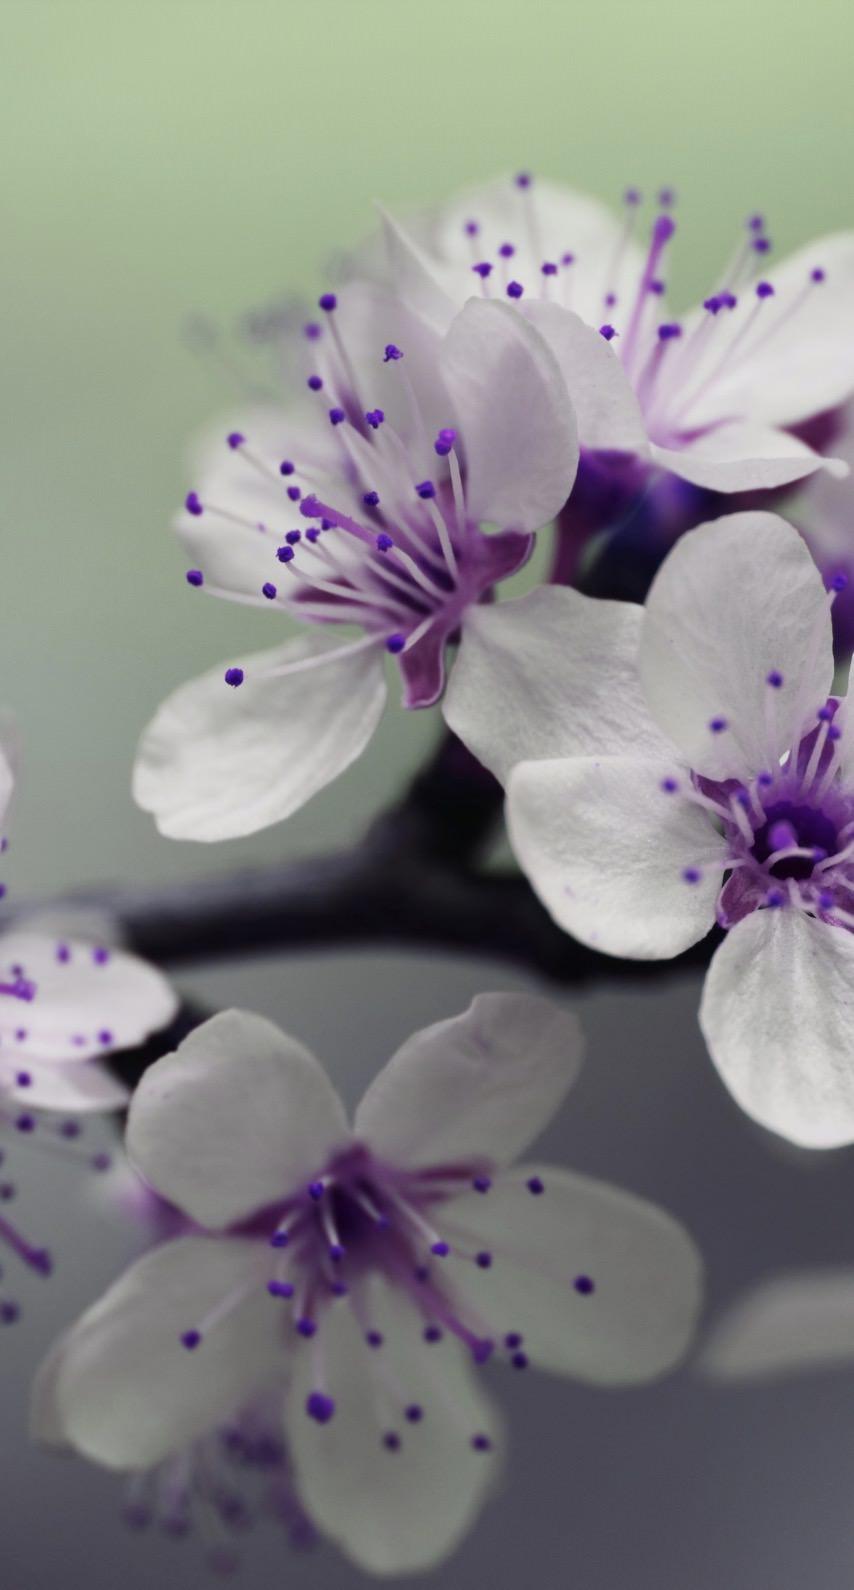 Purple Flower Iphone 7 Wallpaper Flowers Healthy